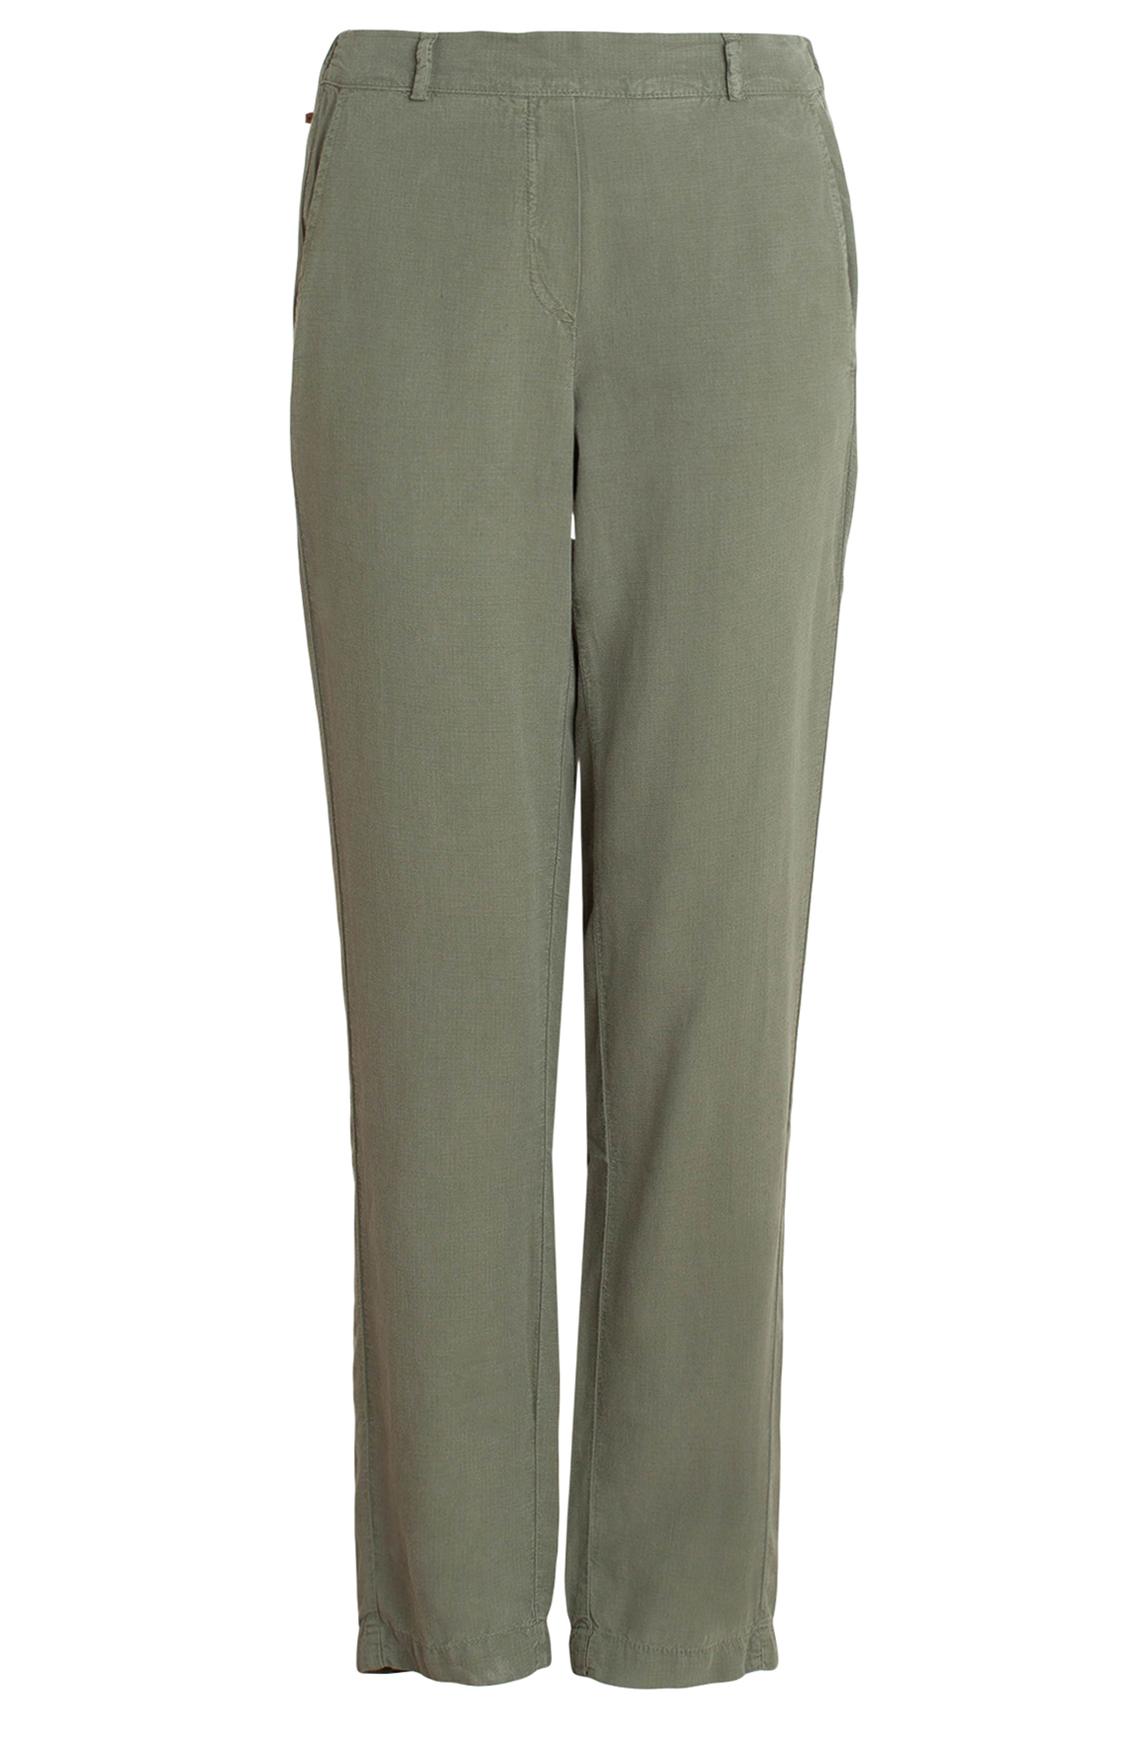 Moscow Dames Tencel pants groen